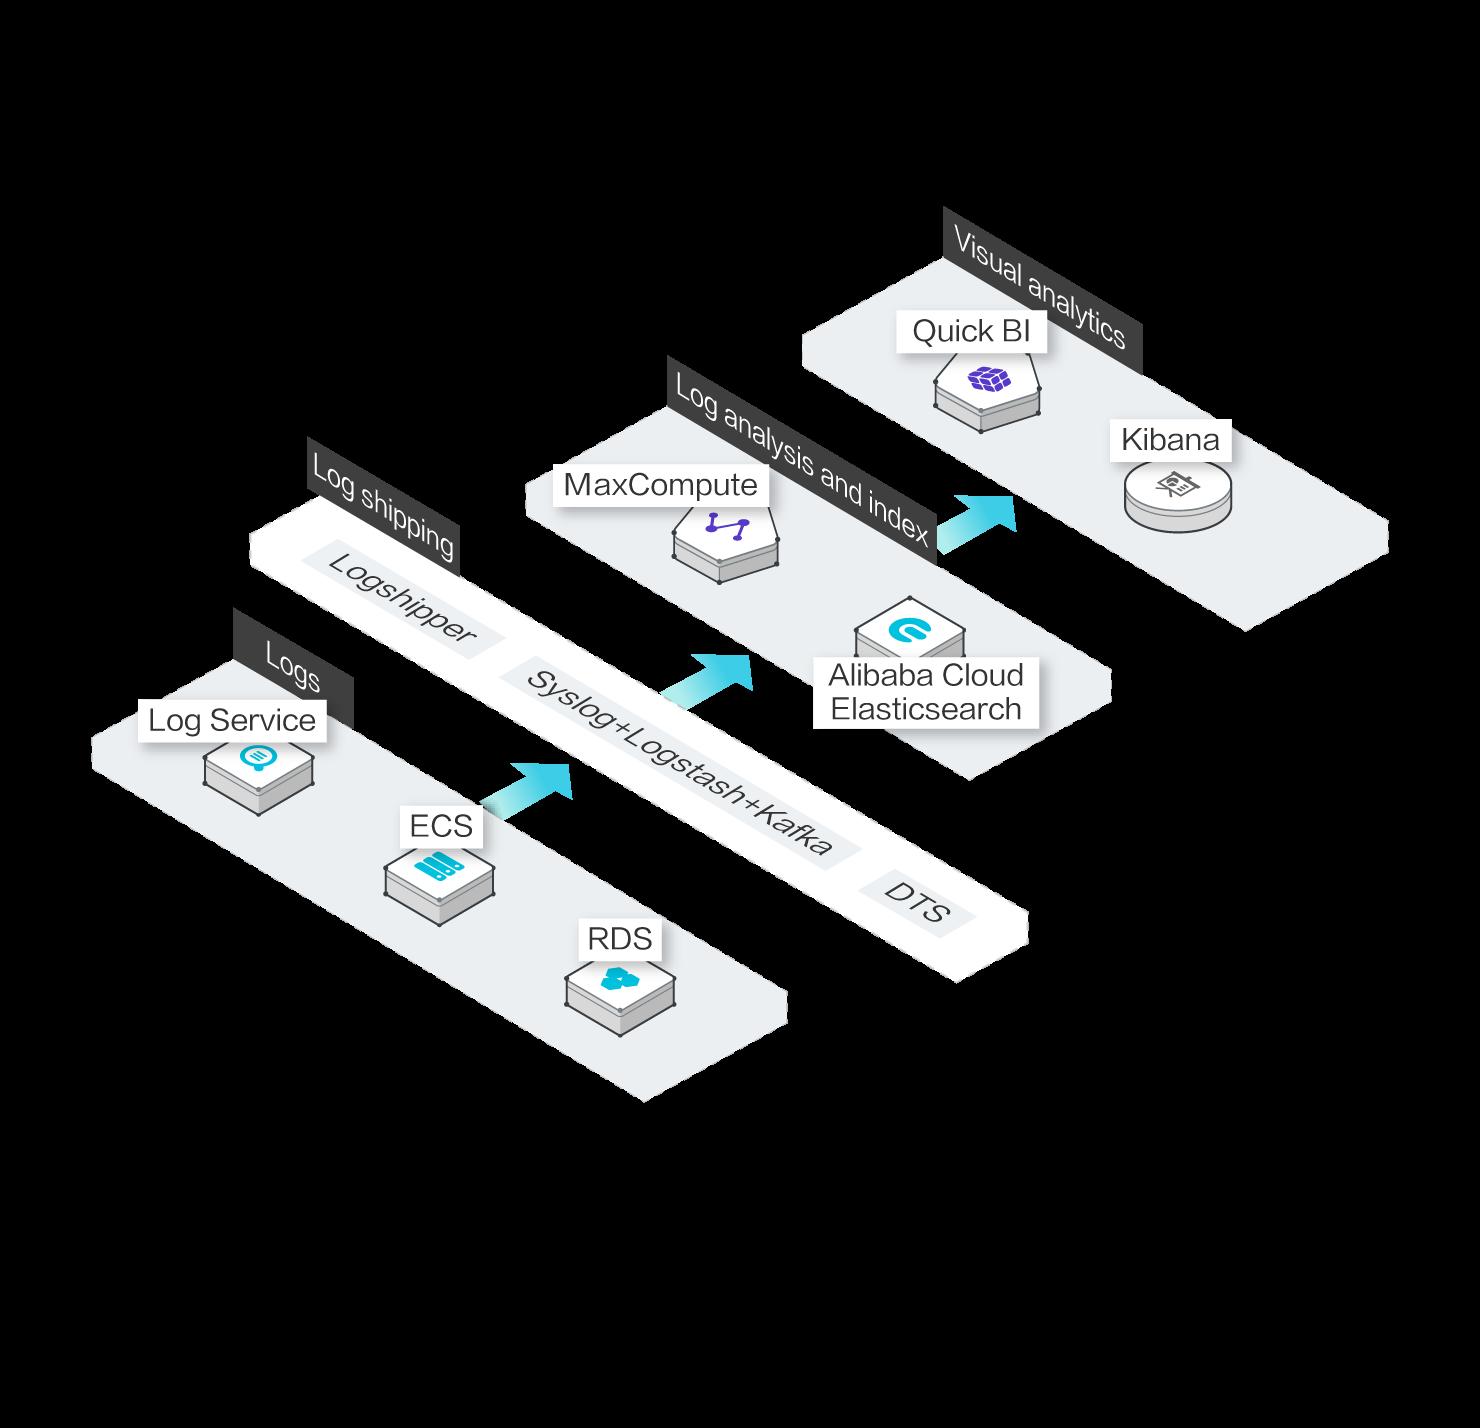 Alibaba Cloud Elasticsearch: Provides Commercial X-Pack Plug